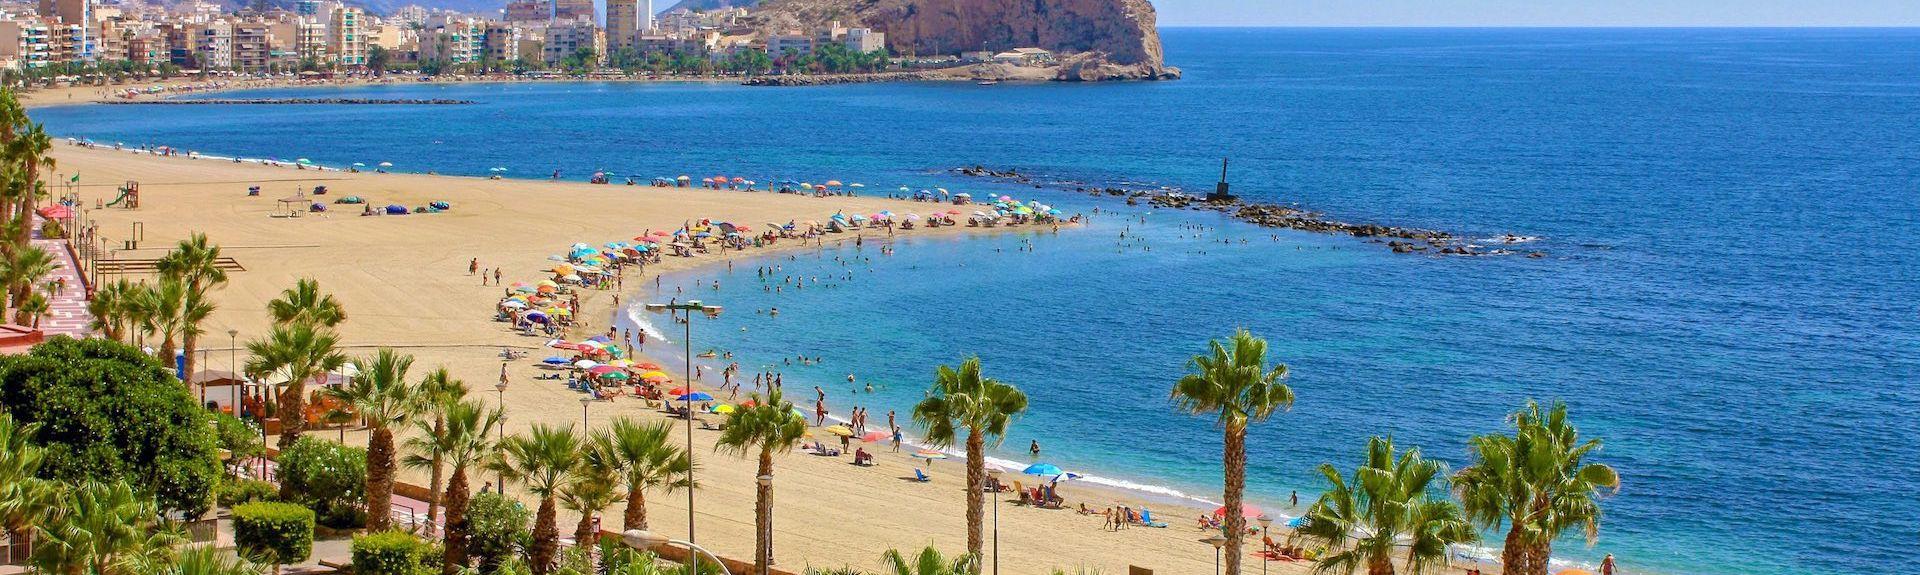 Murcia (region), Spania